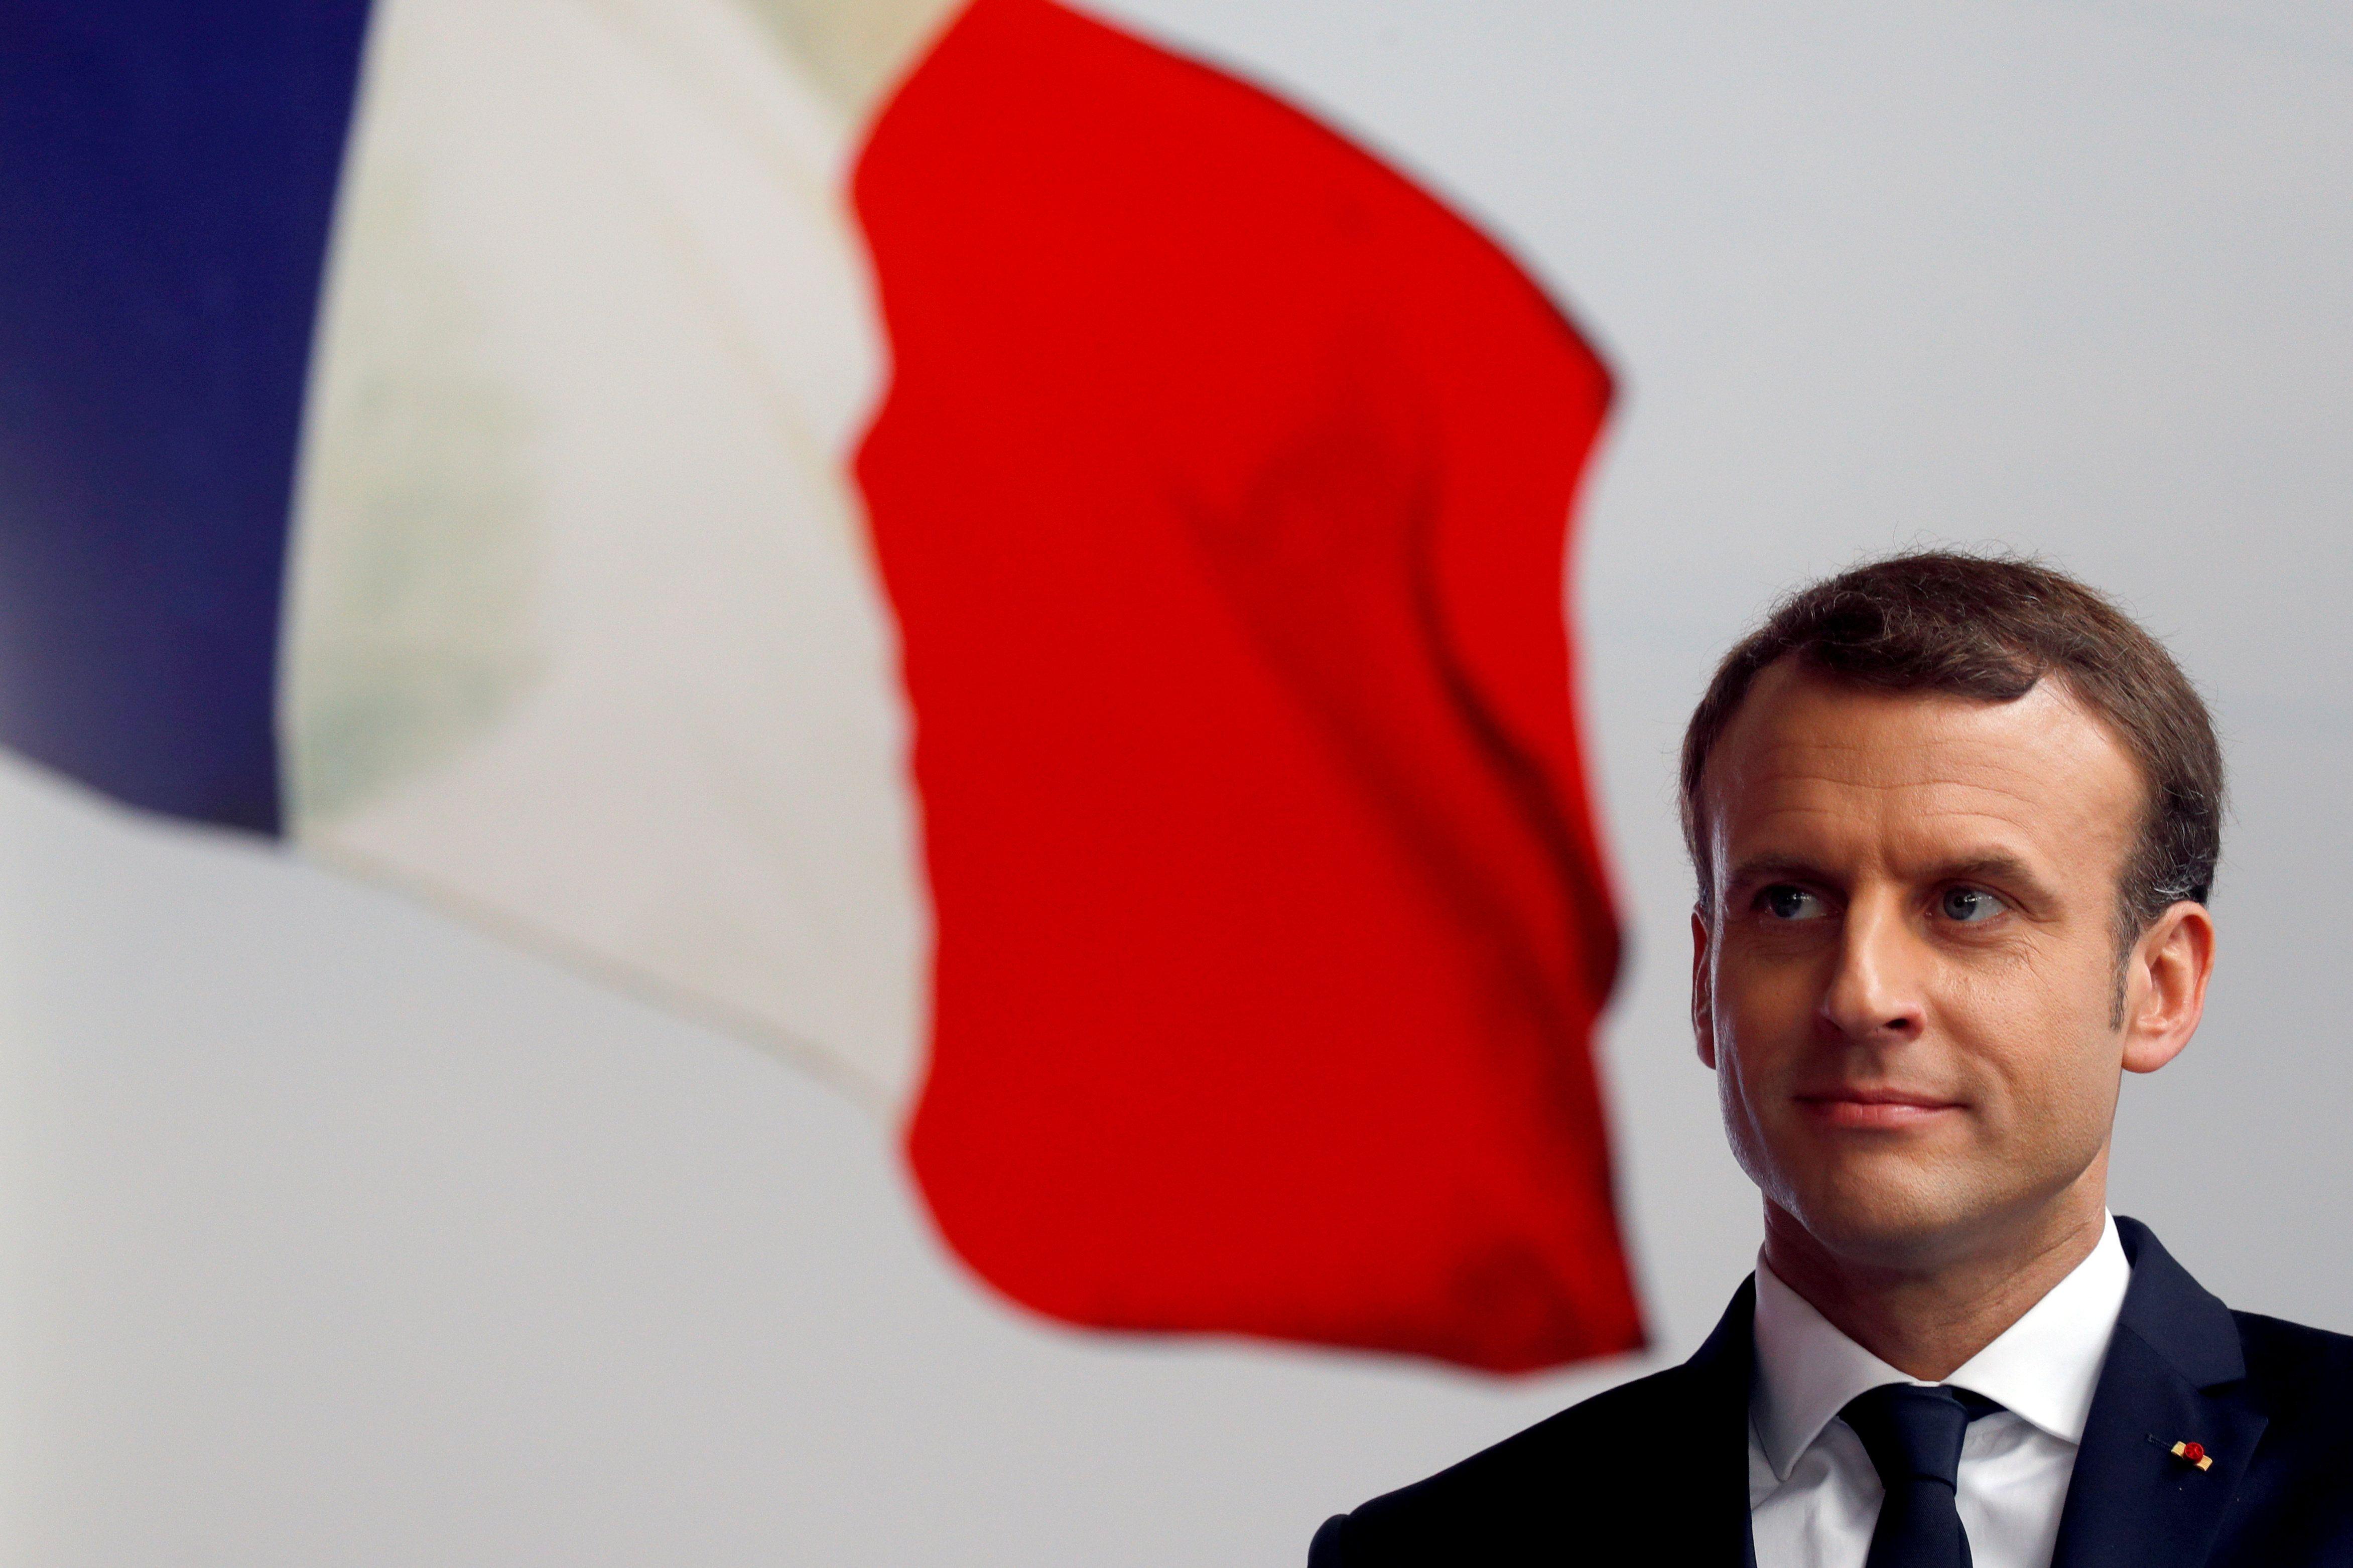 A rough road ahead for Emmanuel Macron